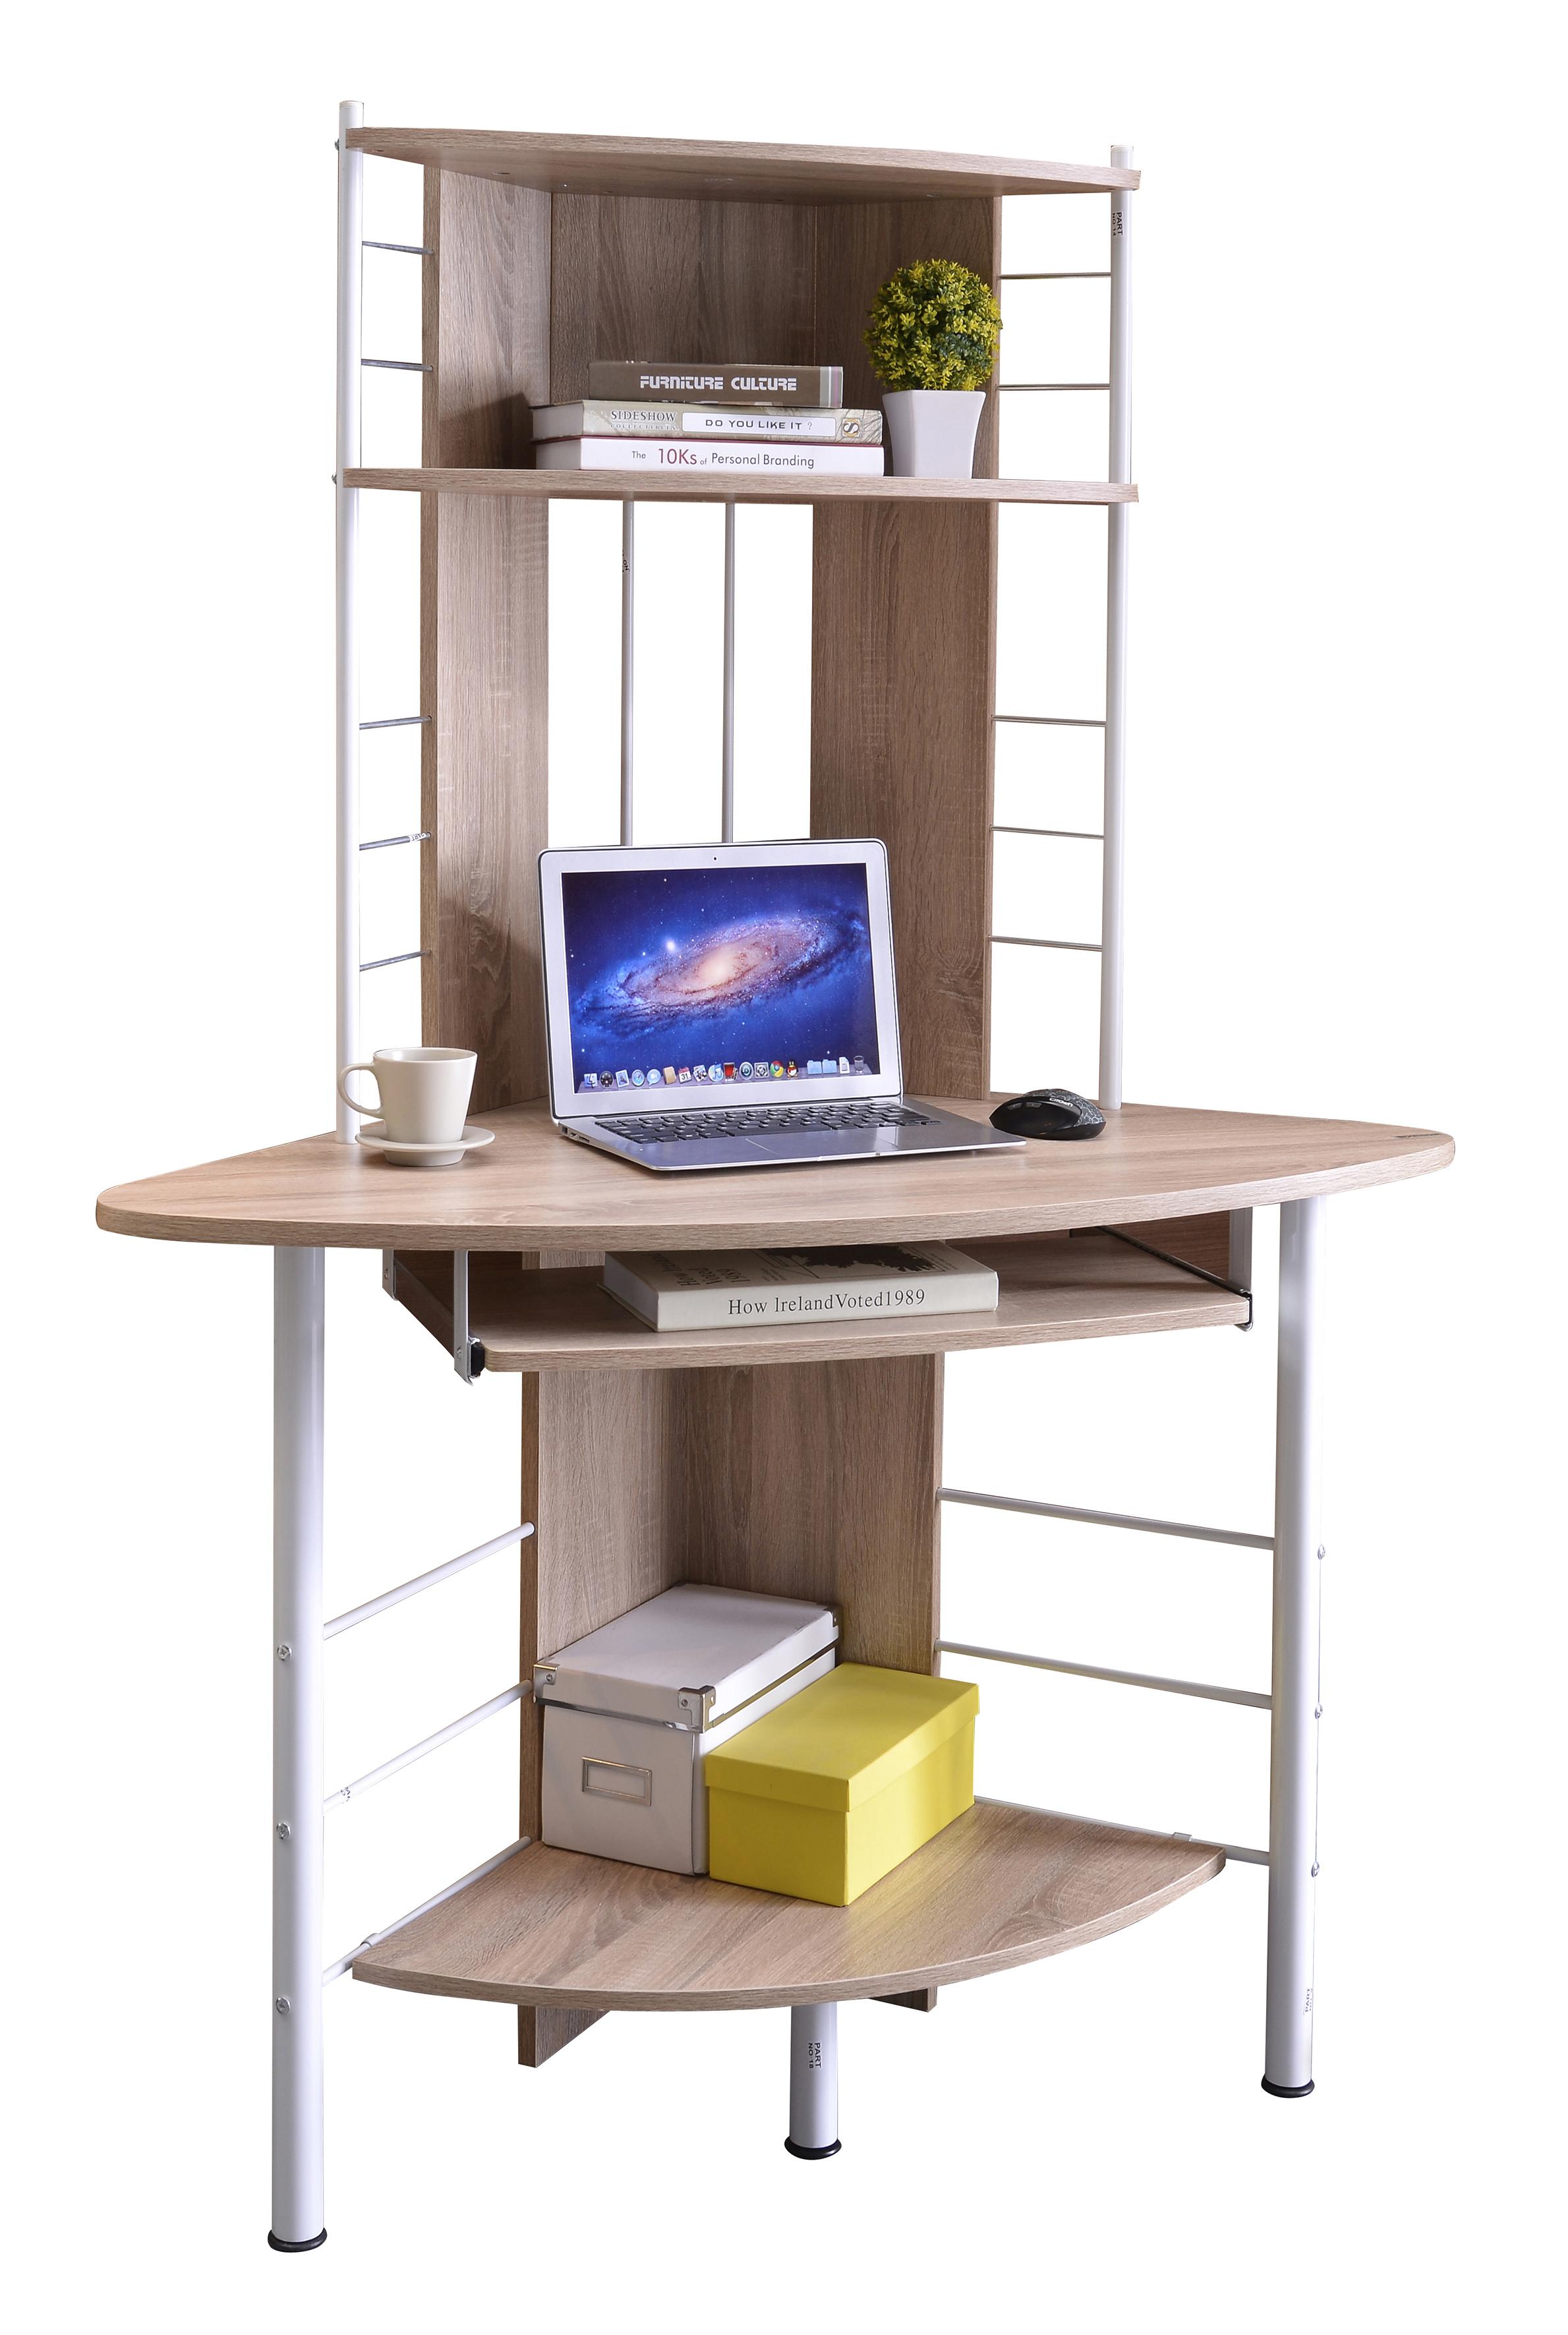 sixbros corner computer desk workstation work table